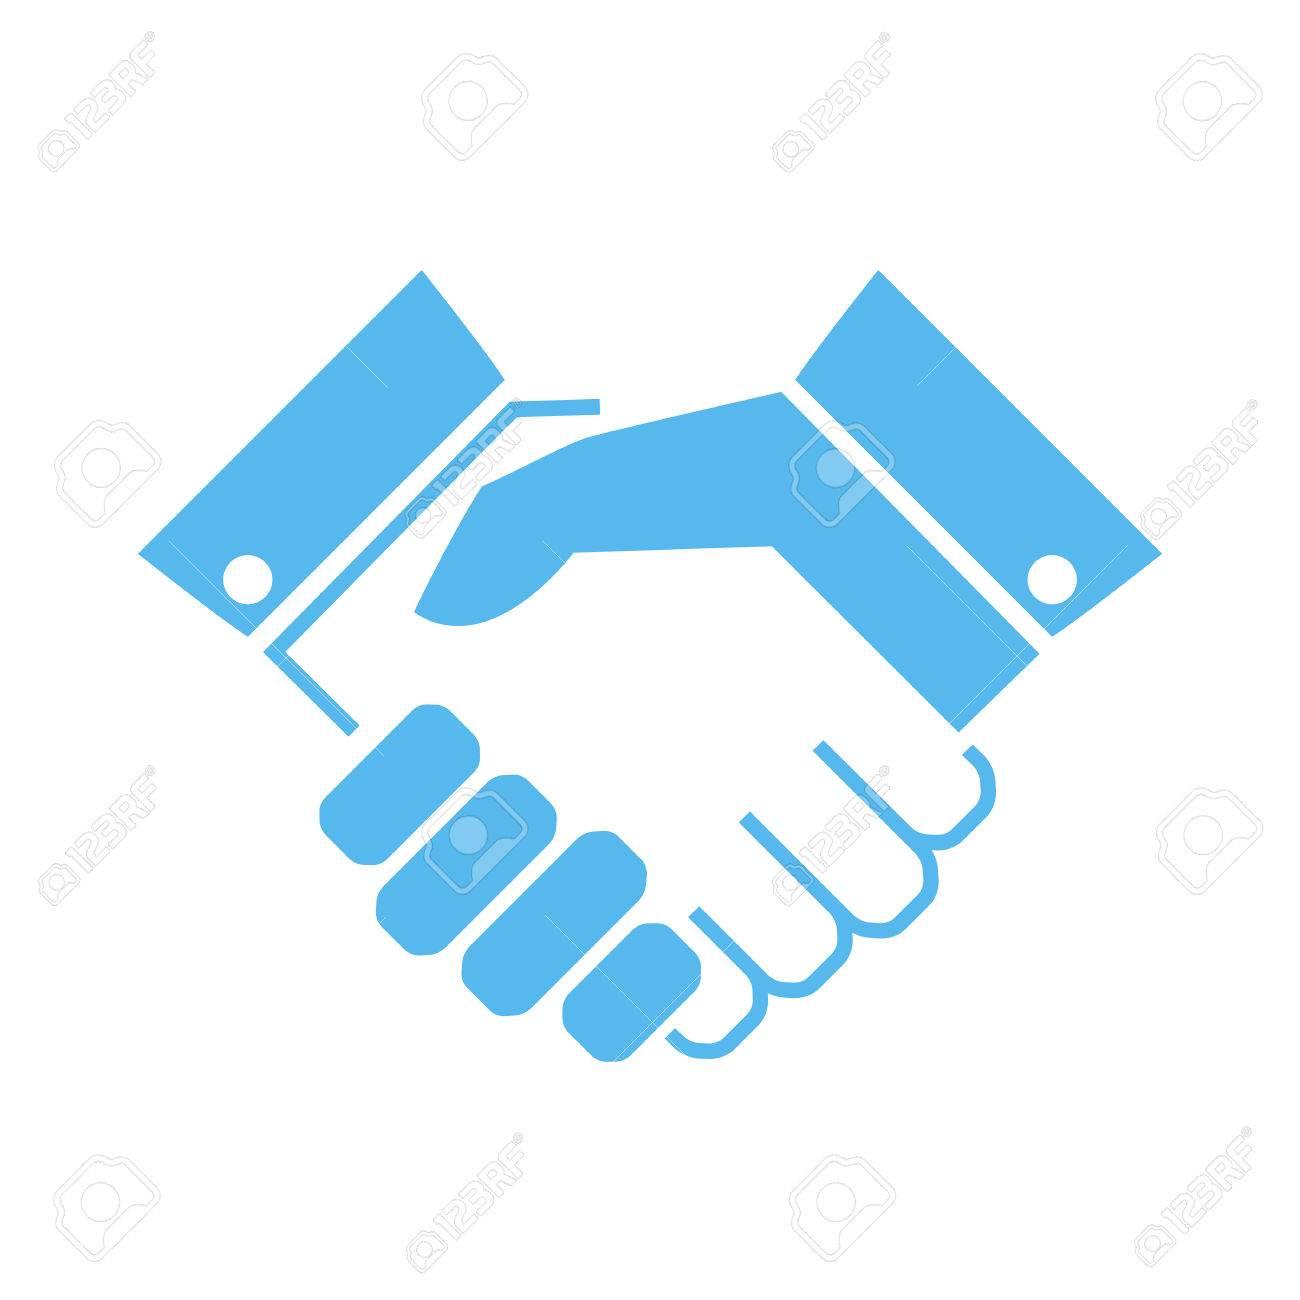 Handshake vector icon - 67623661